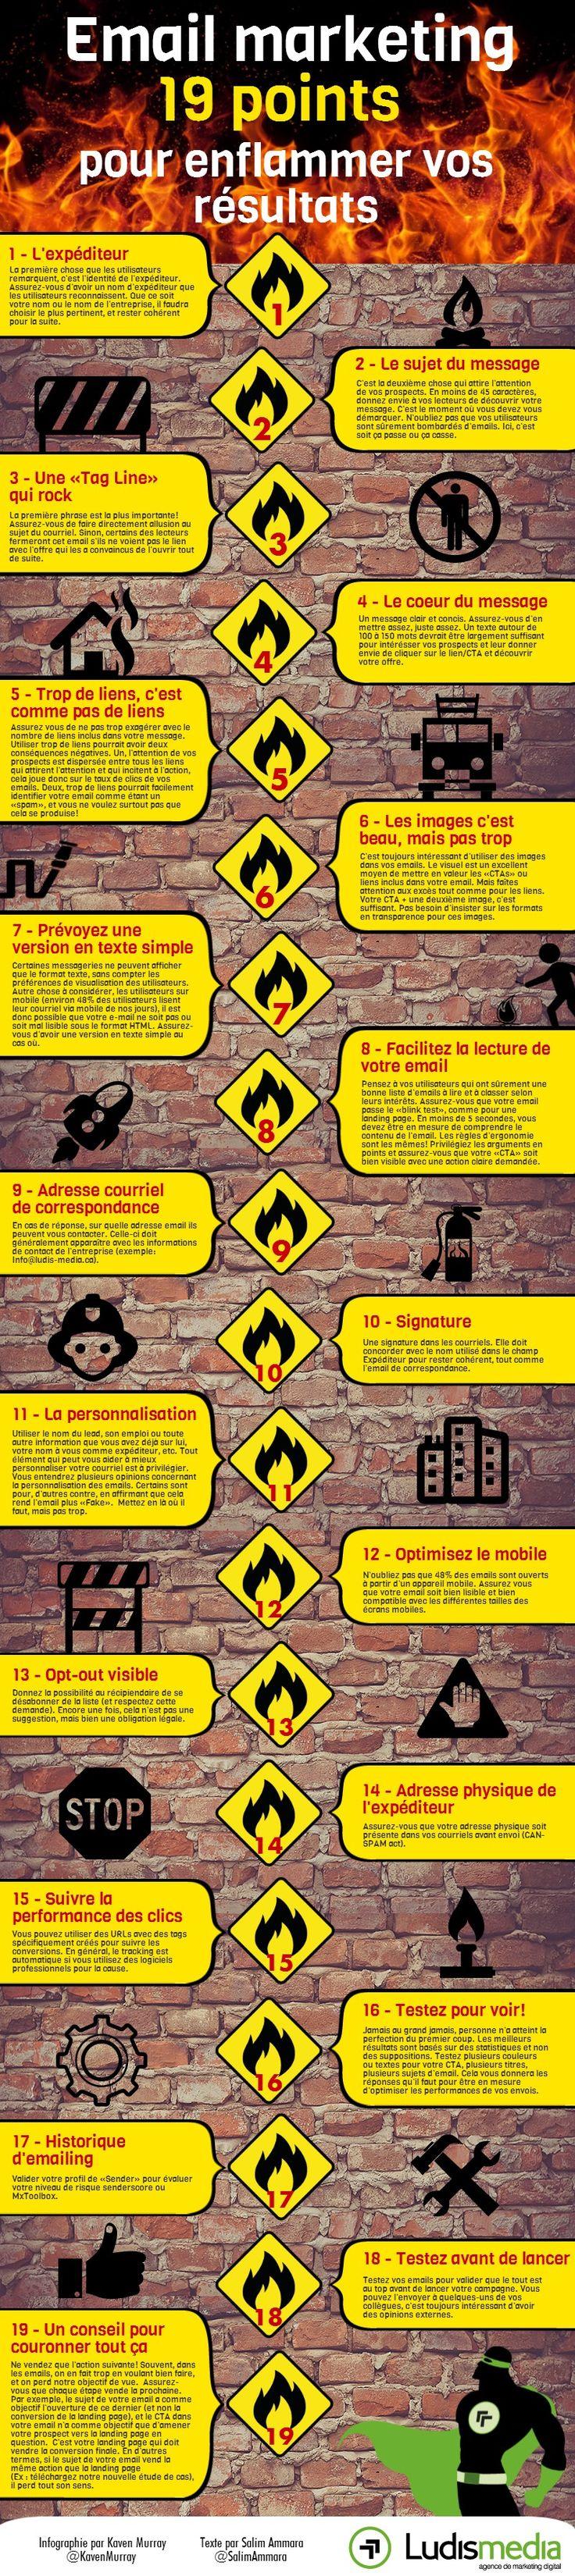 19 point enflammer email marketing 17 07 2014 3 Comment créer lemail parfait   Check list [Infographie]